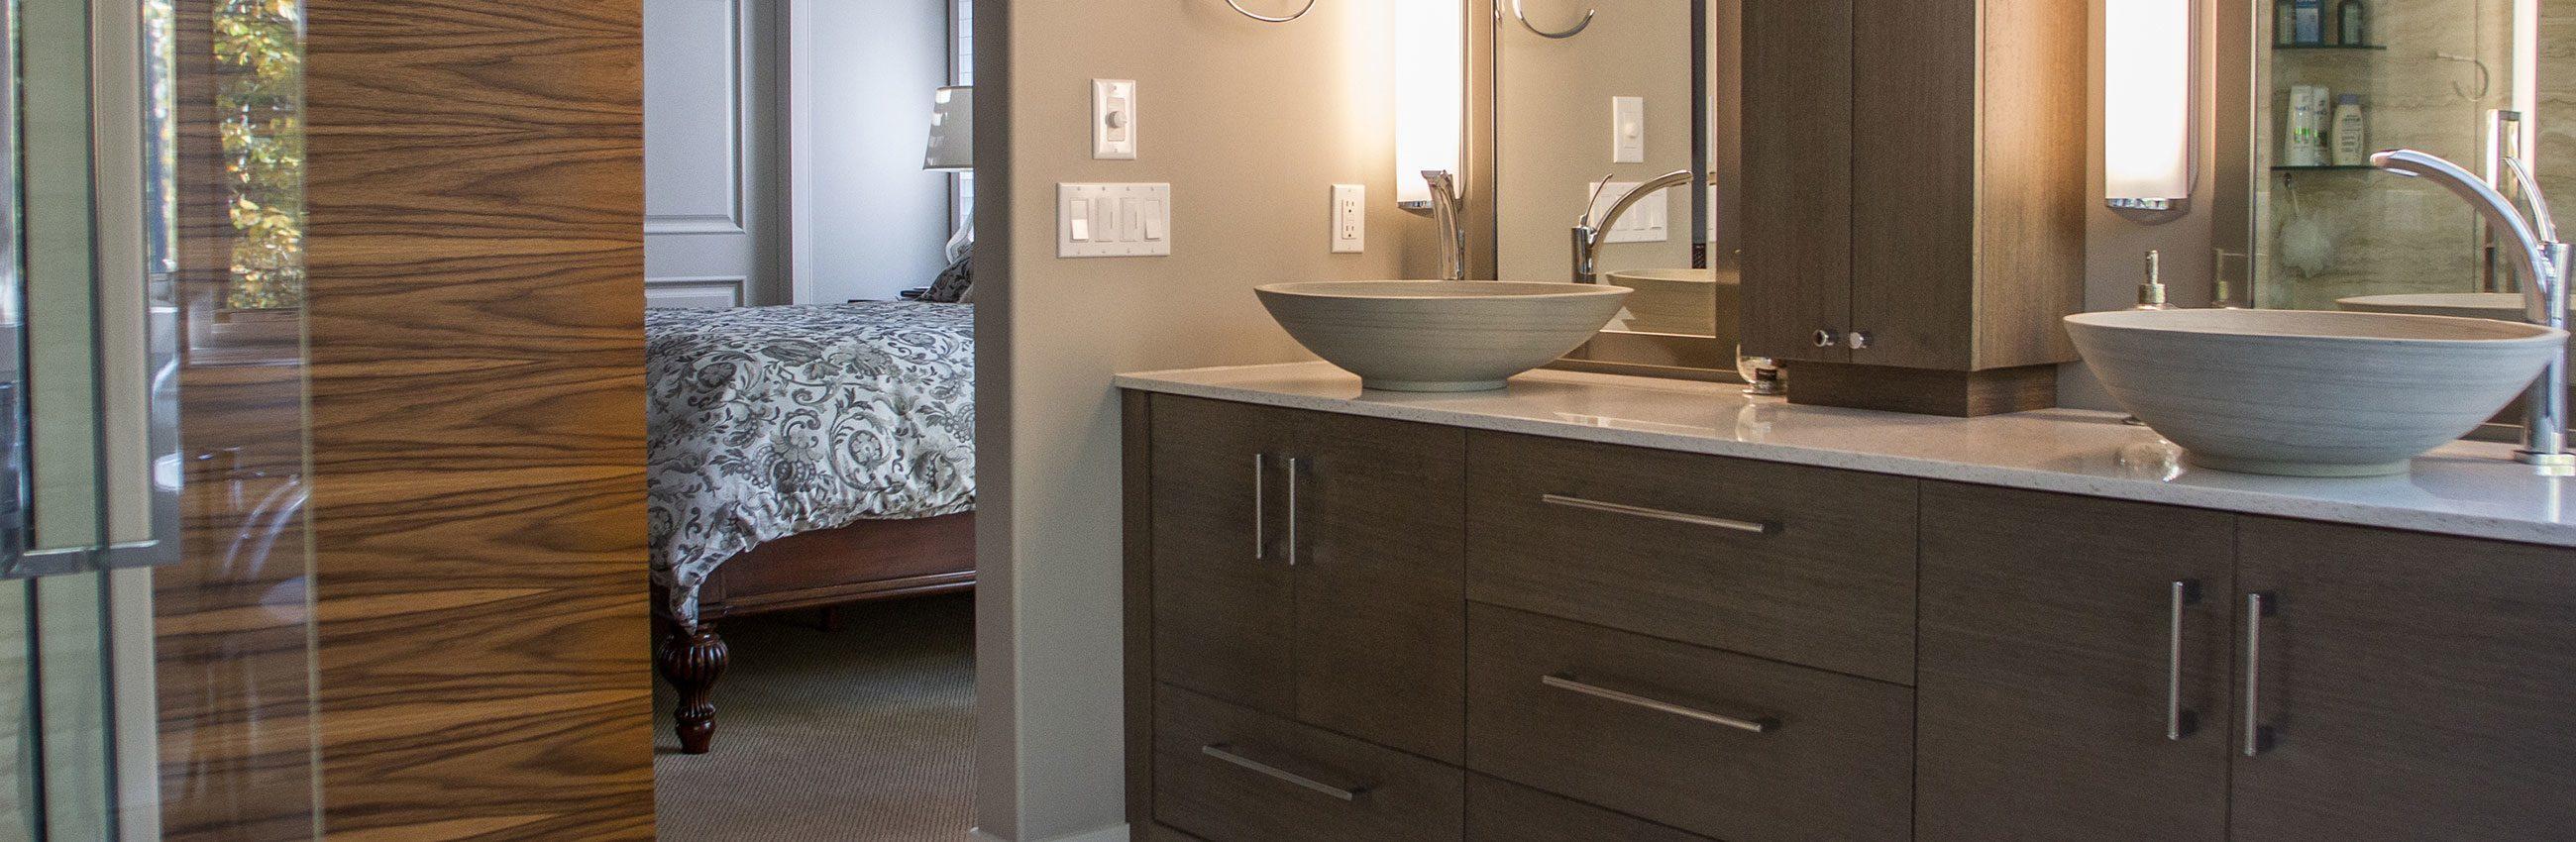 Athena Industries Bathroom Cabinets